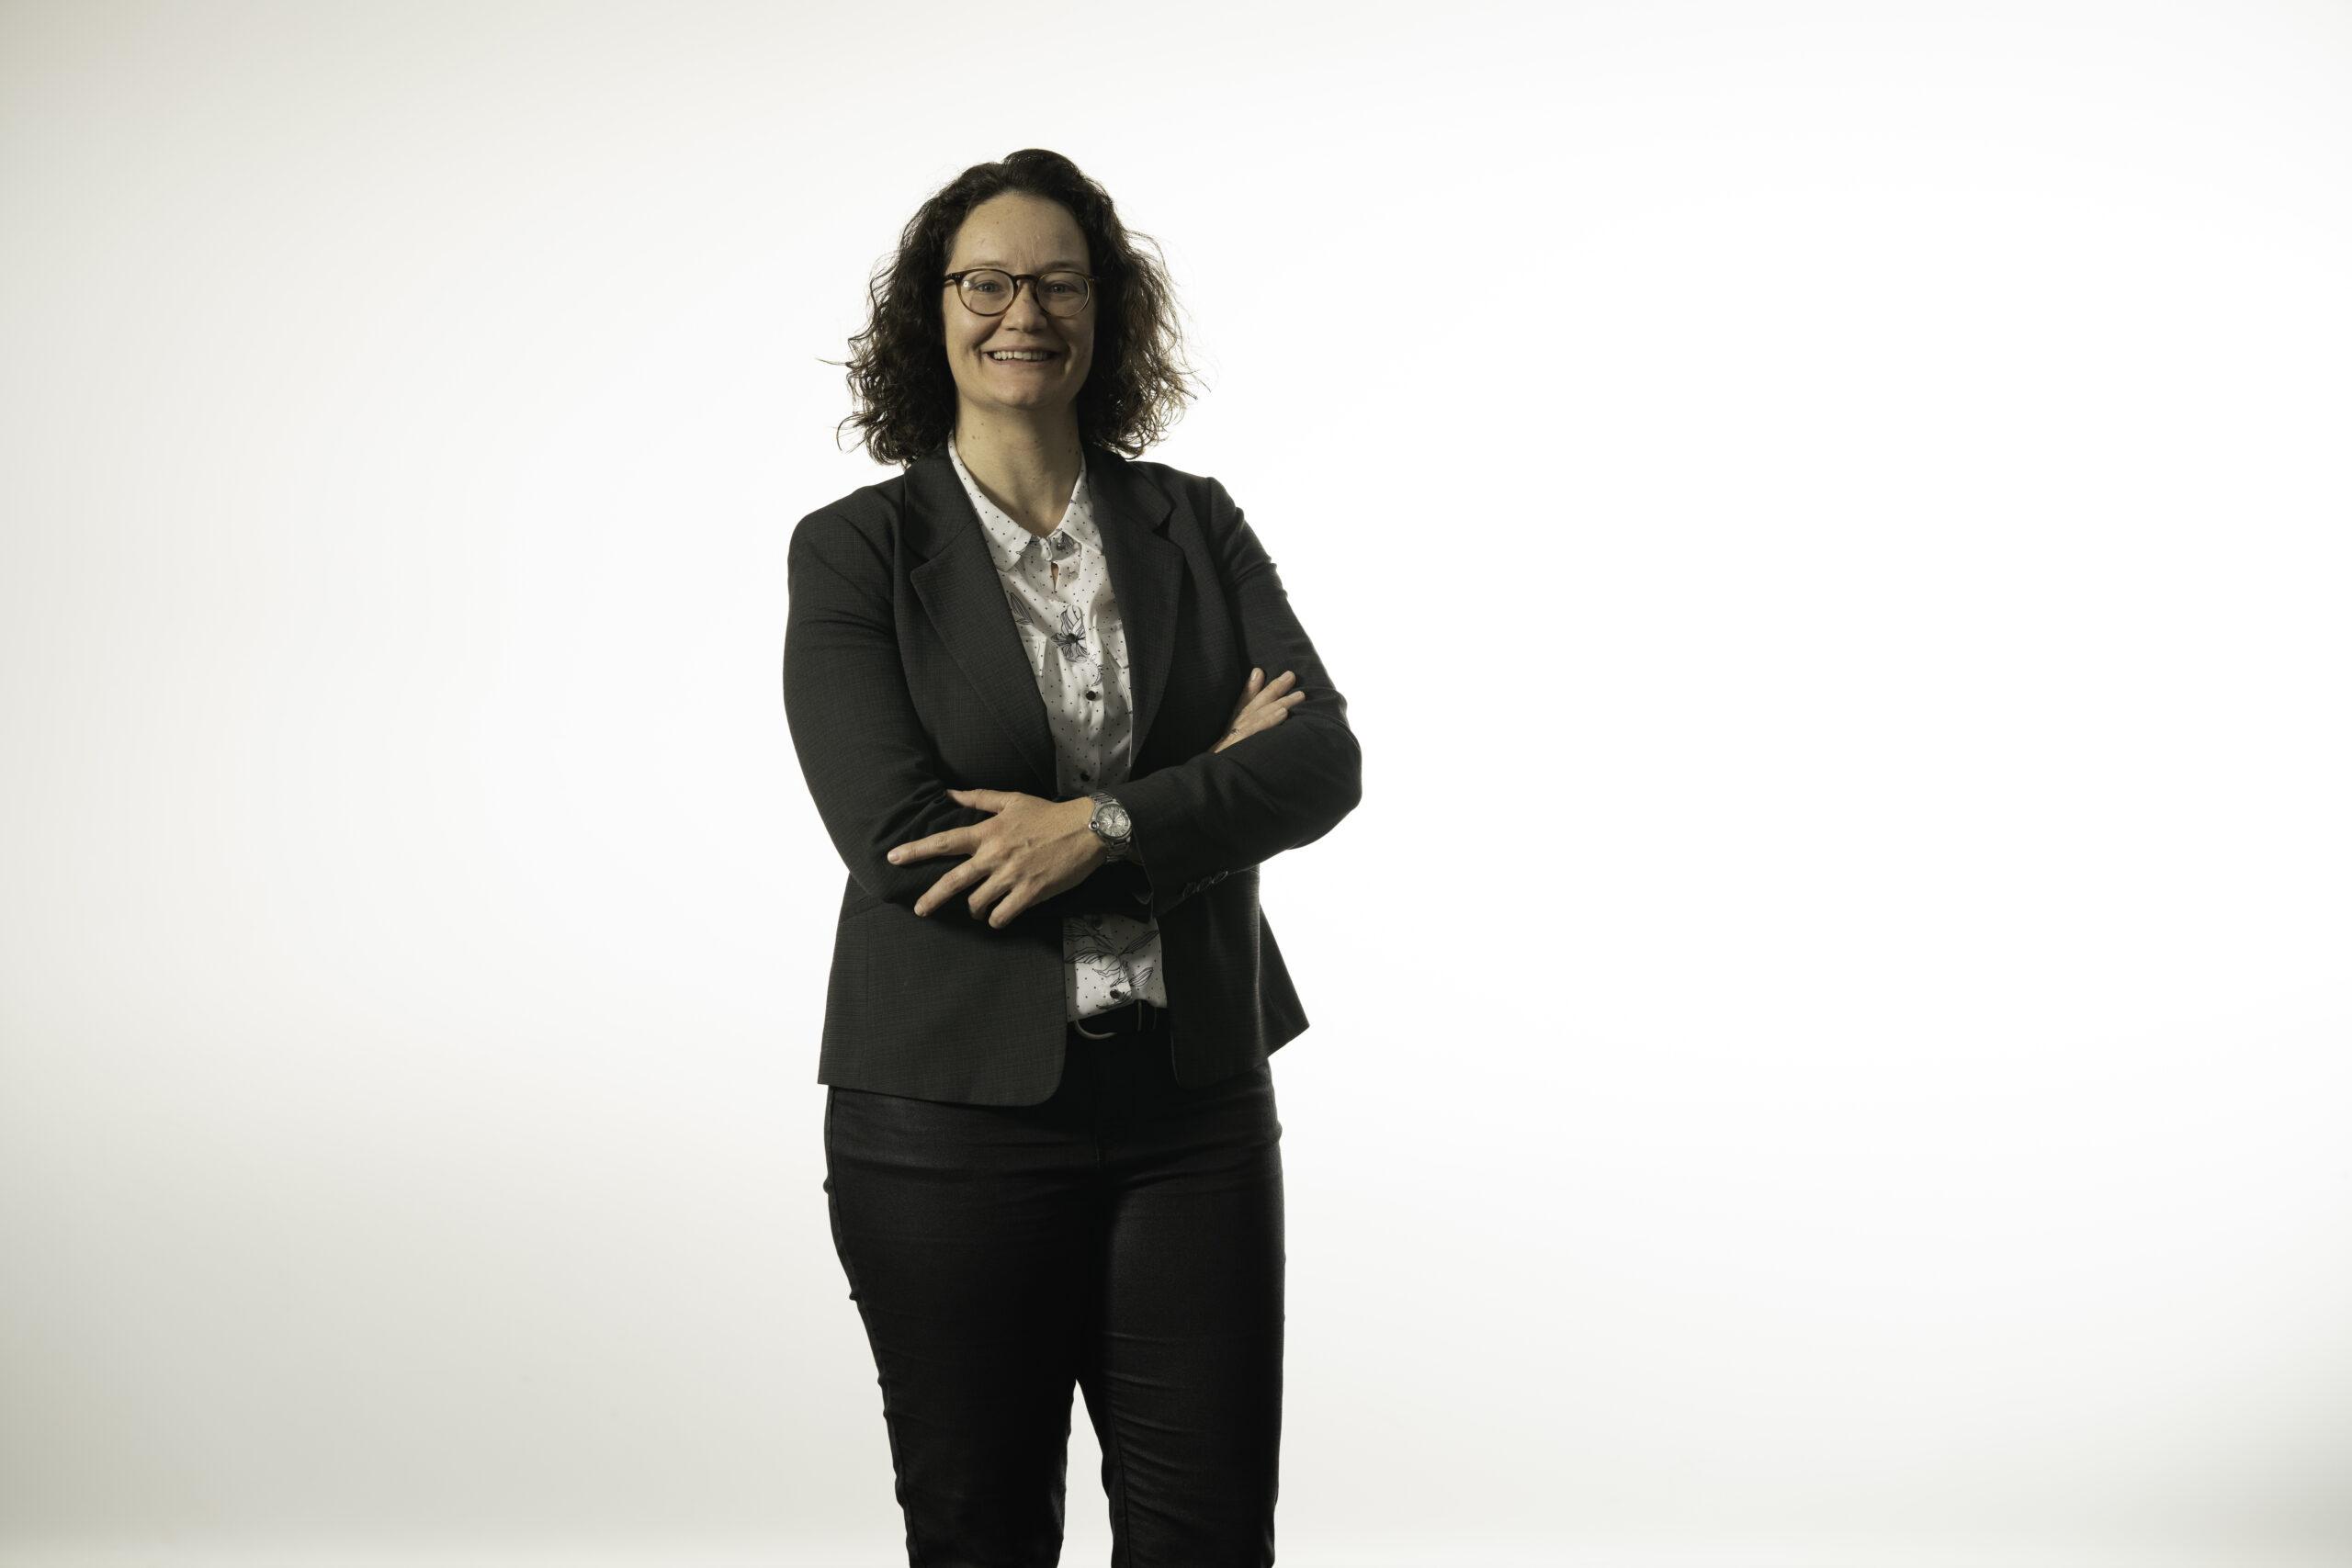 Susan Manns